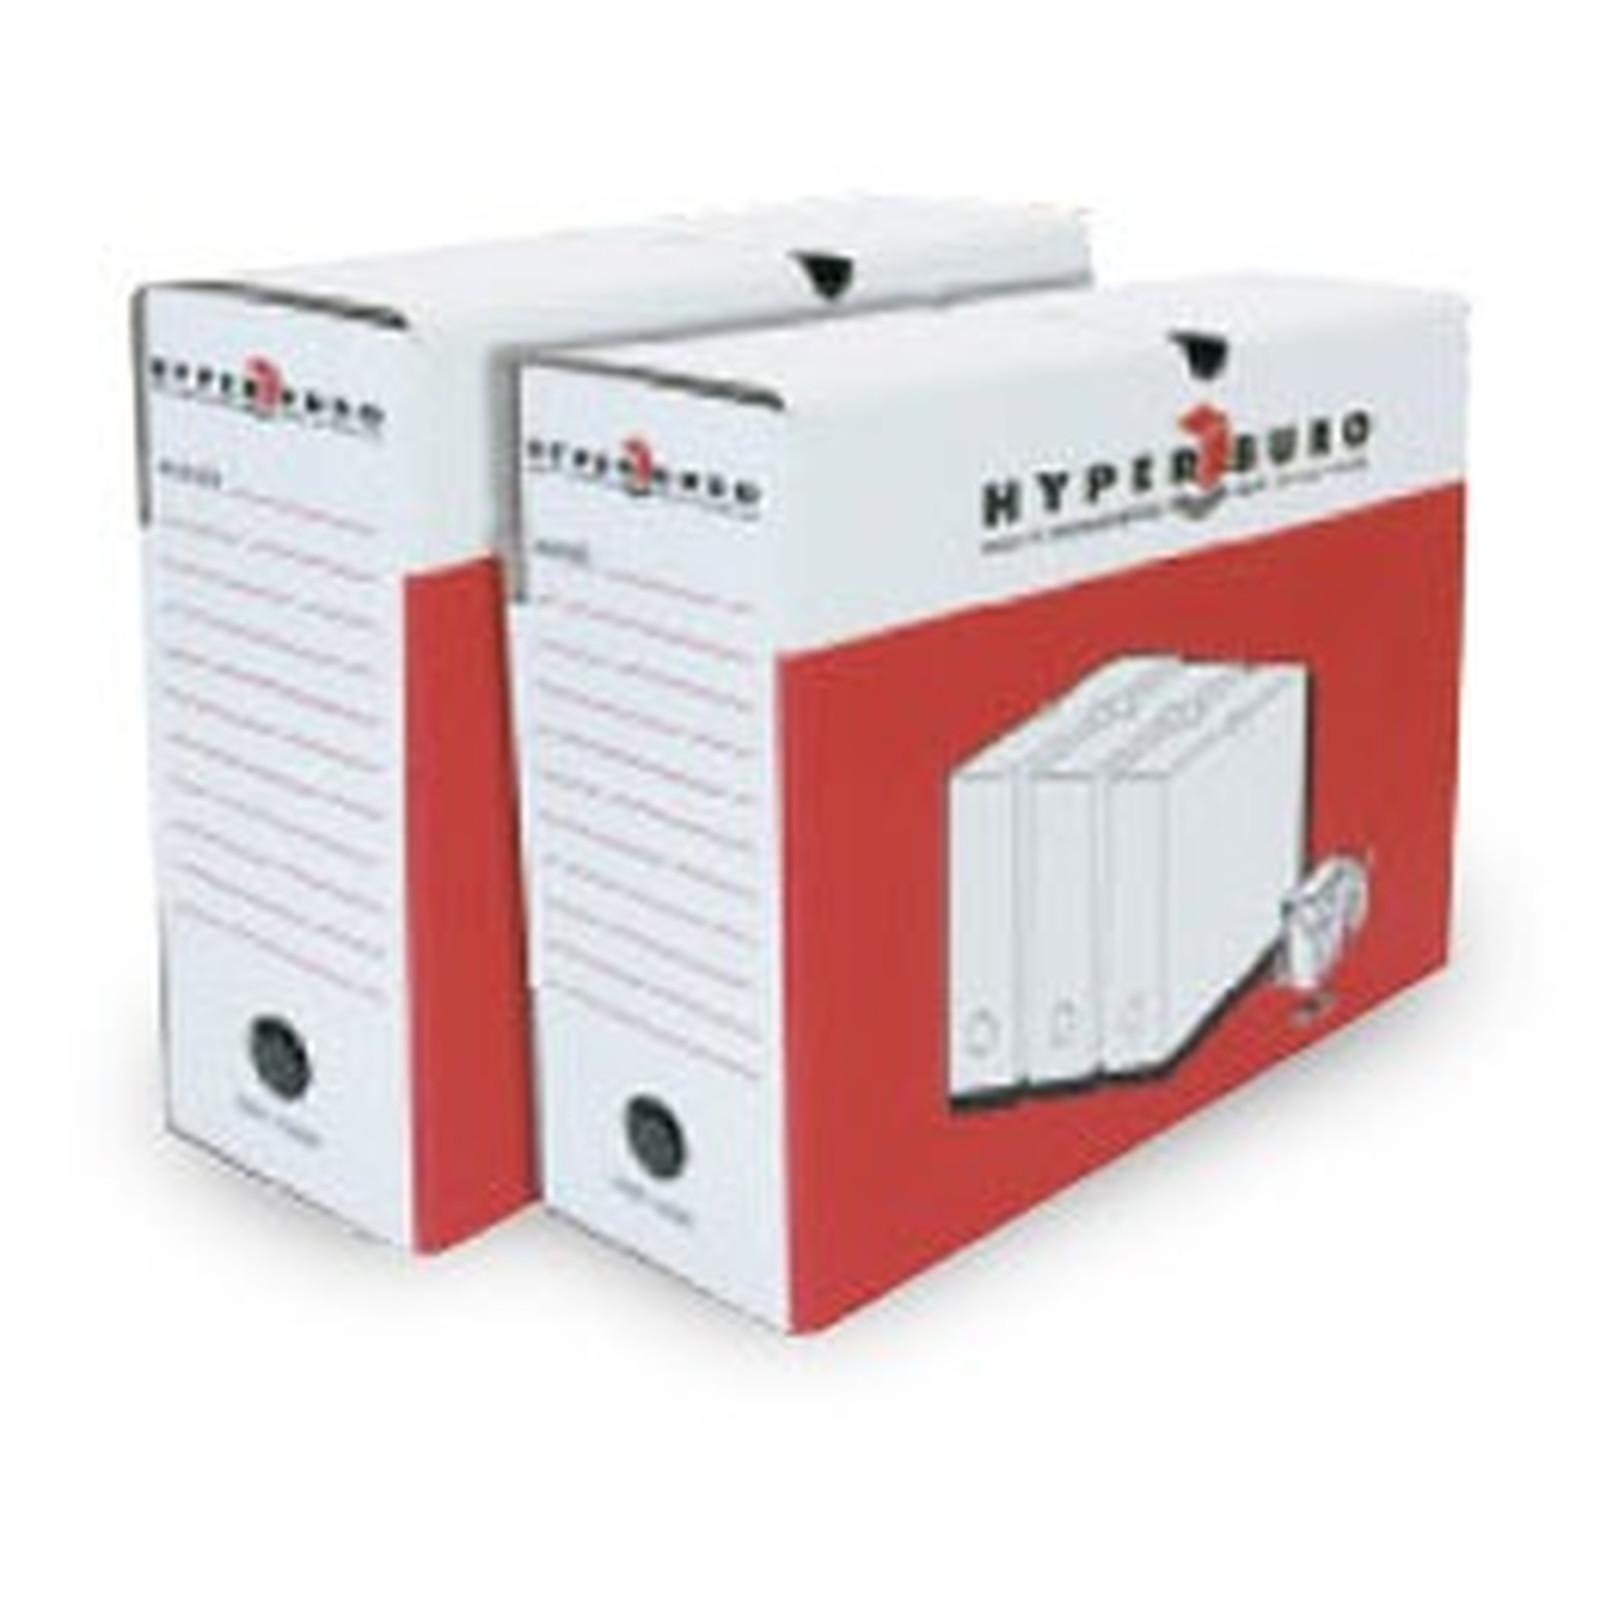 HYPERBURO 10 boîtes à archives 33 x 25 cm dos 10 cm